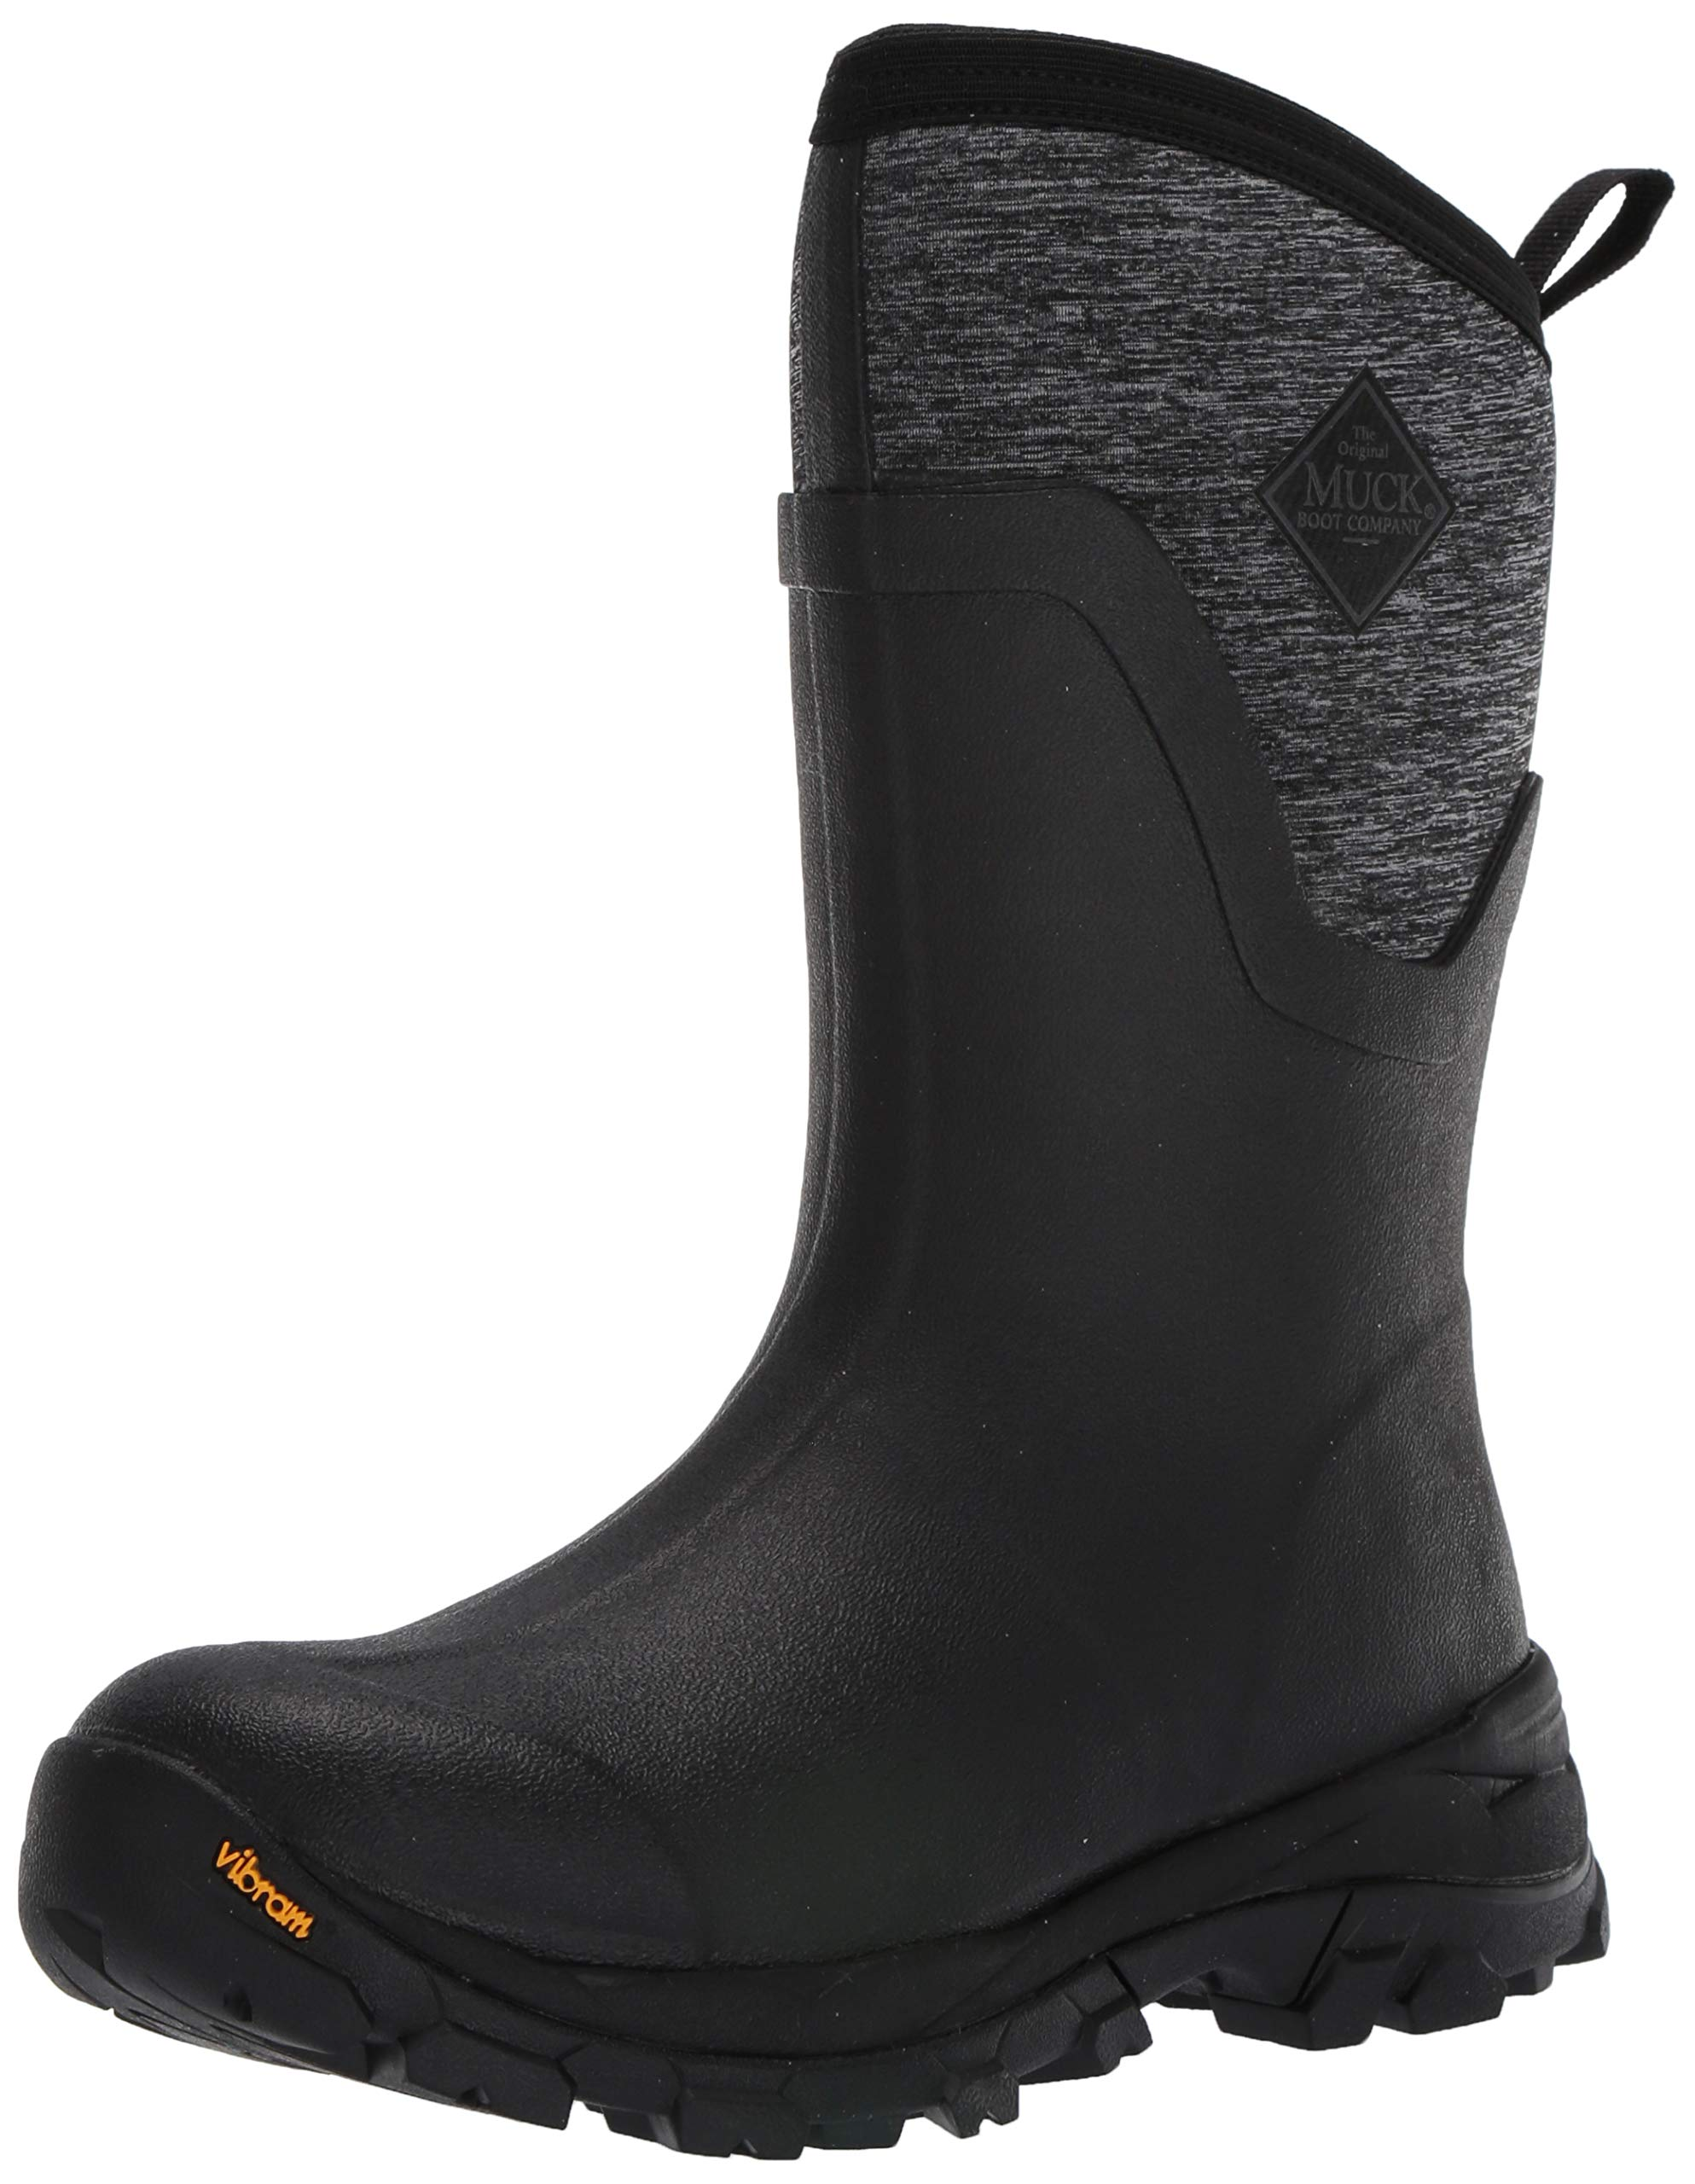 Muck Boot Women's Arctic Ice Mid Snow Boot, Black/Heather Jersey, 8 Regular US by Muck Boot